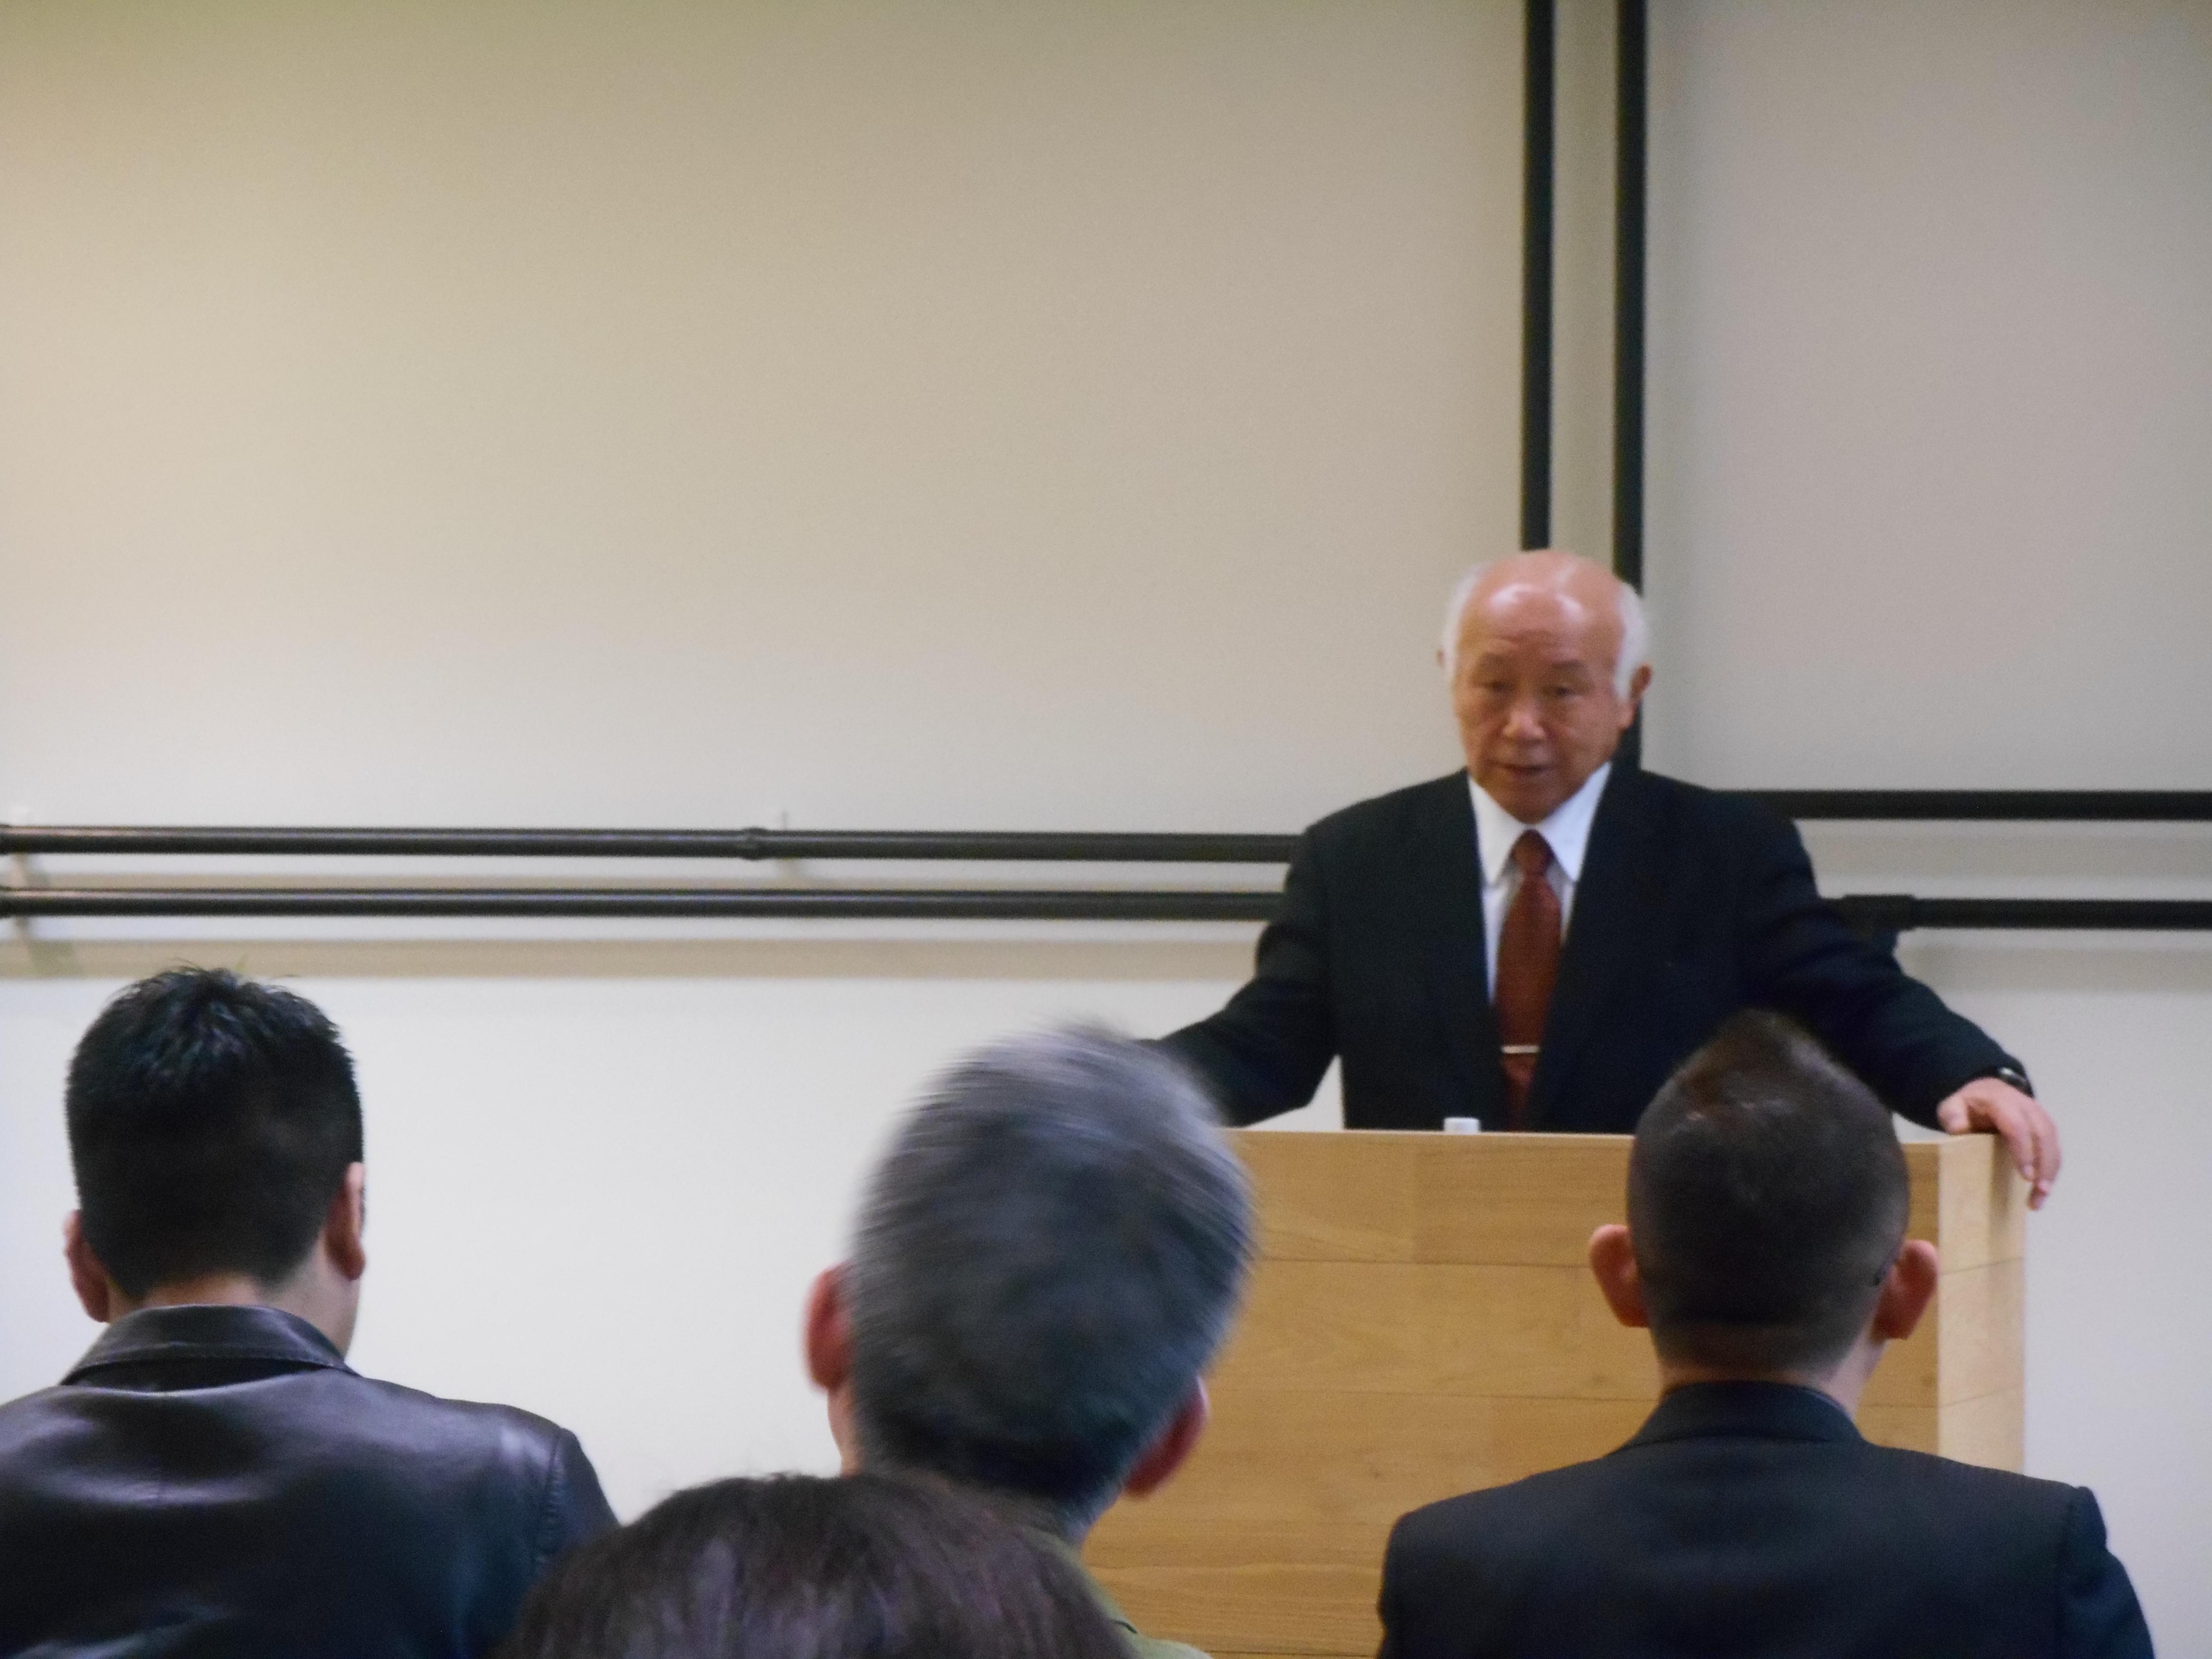 DSCN3727 - 平成30年度 東京思風塾 4月7日(土)「時代が問題をつくり、問題が人物をつくる」